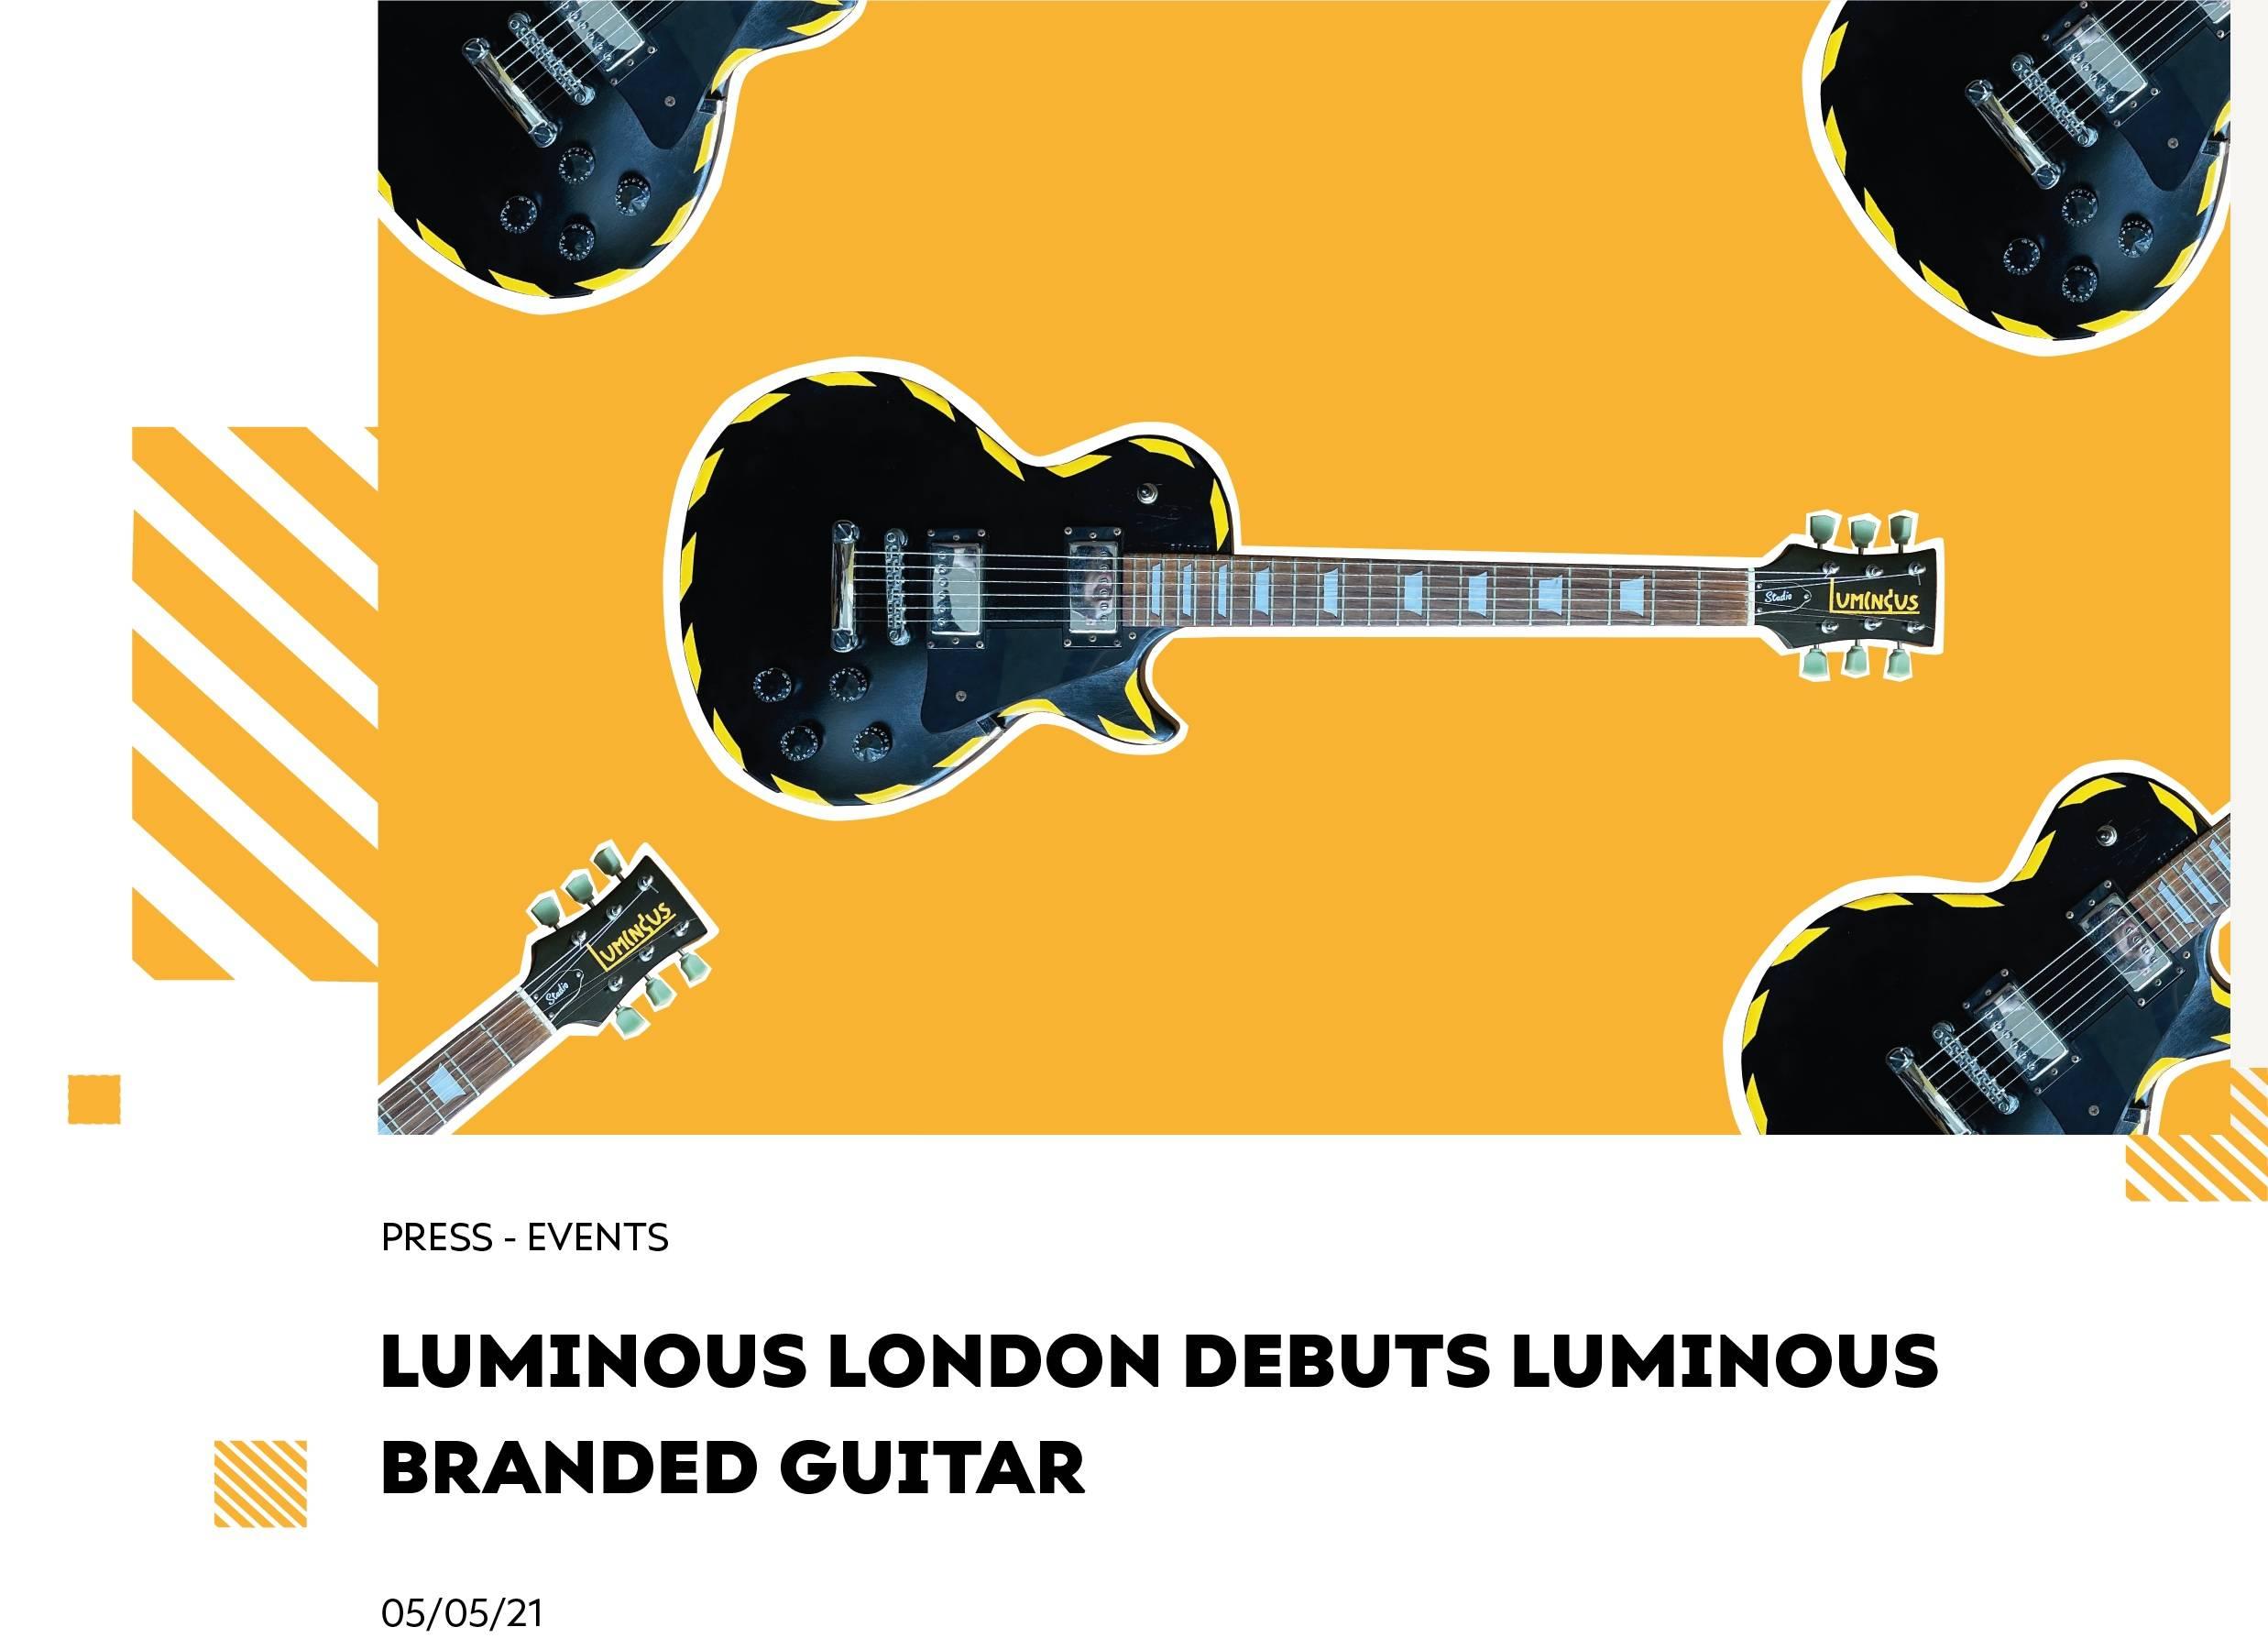 Luminous London Debuts Luminous Branded Guitar